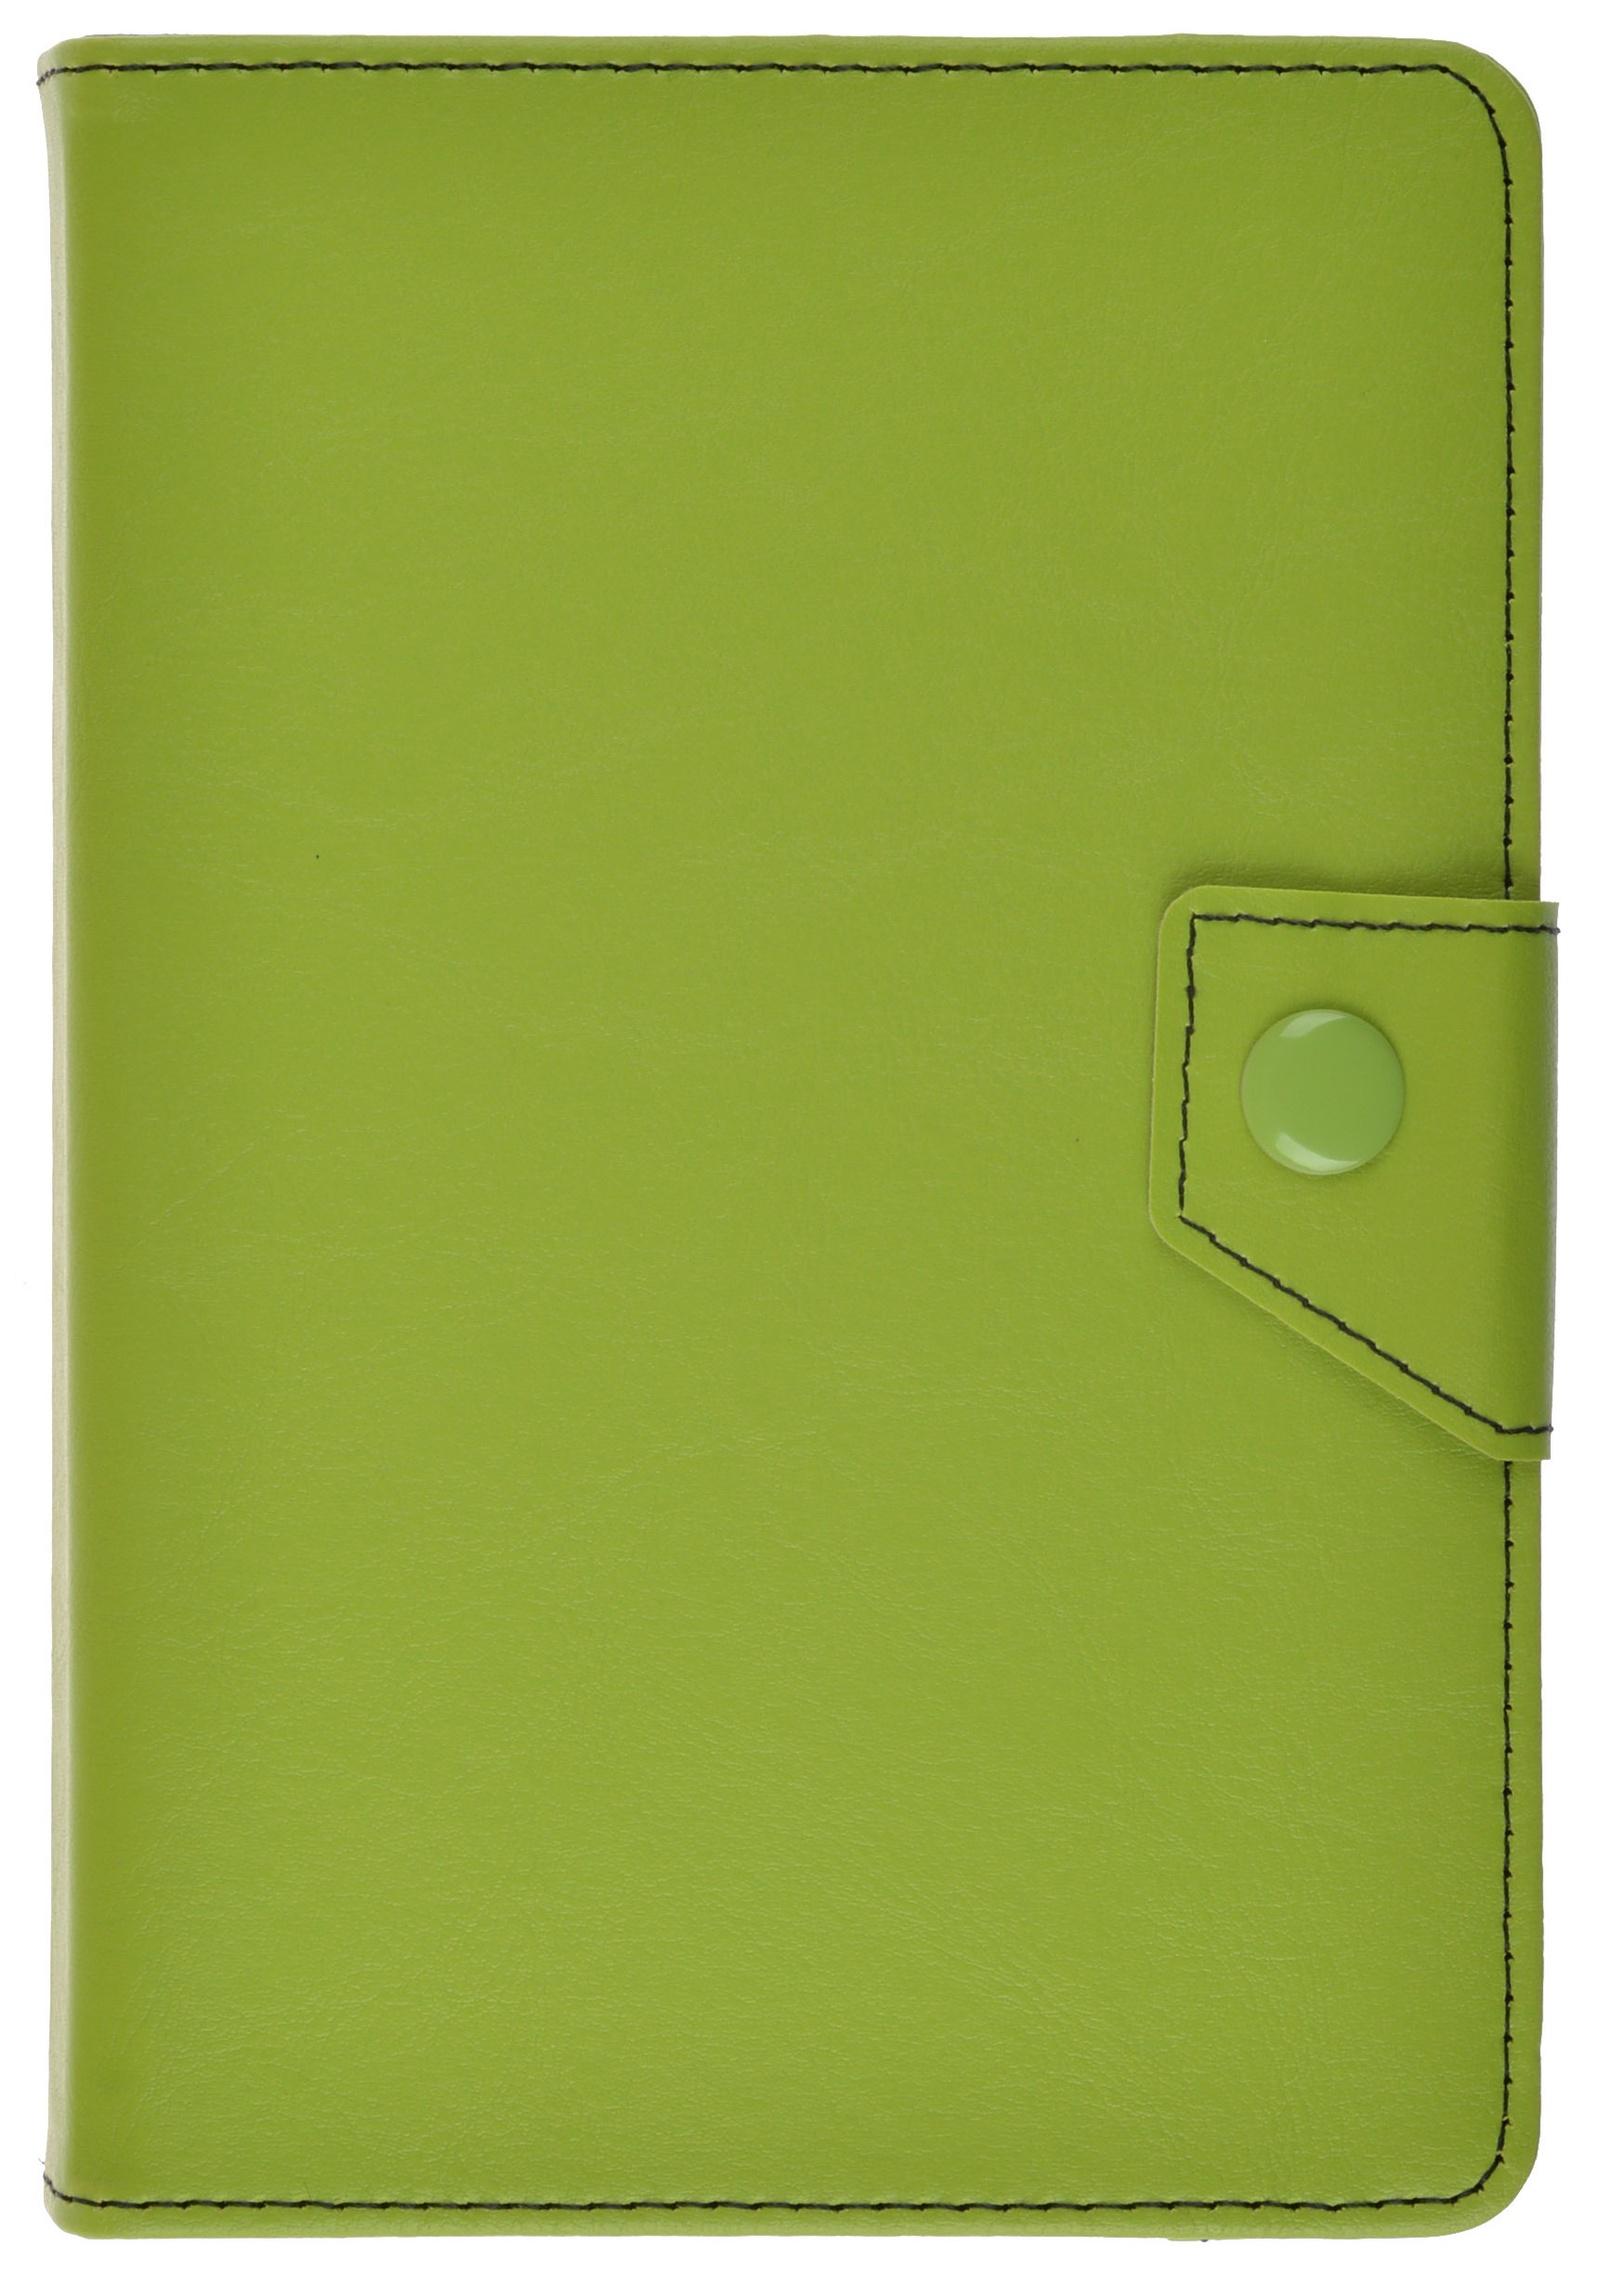 Чехол для планшета ProShield Standard slim clips8, 4630042525689, зеленый чехол универсальный proshield standard clips8 2000000139876 золотистый